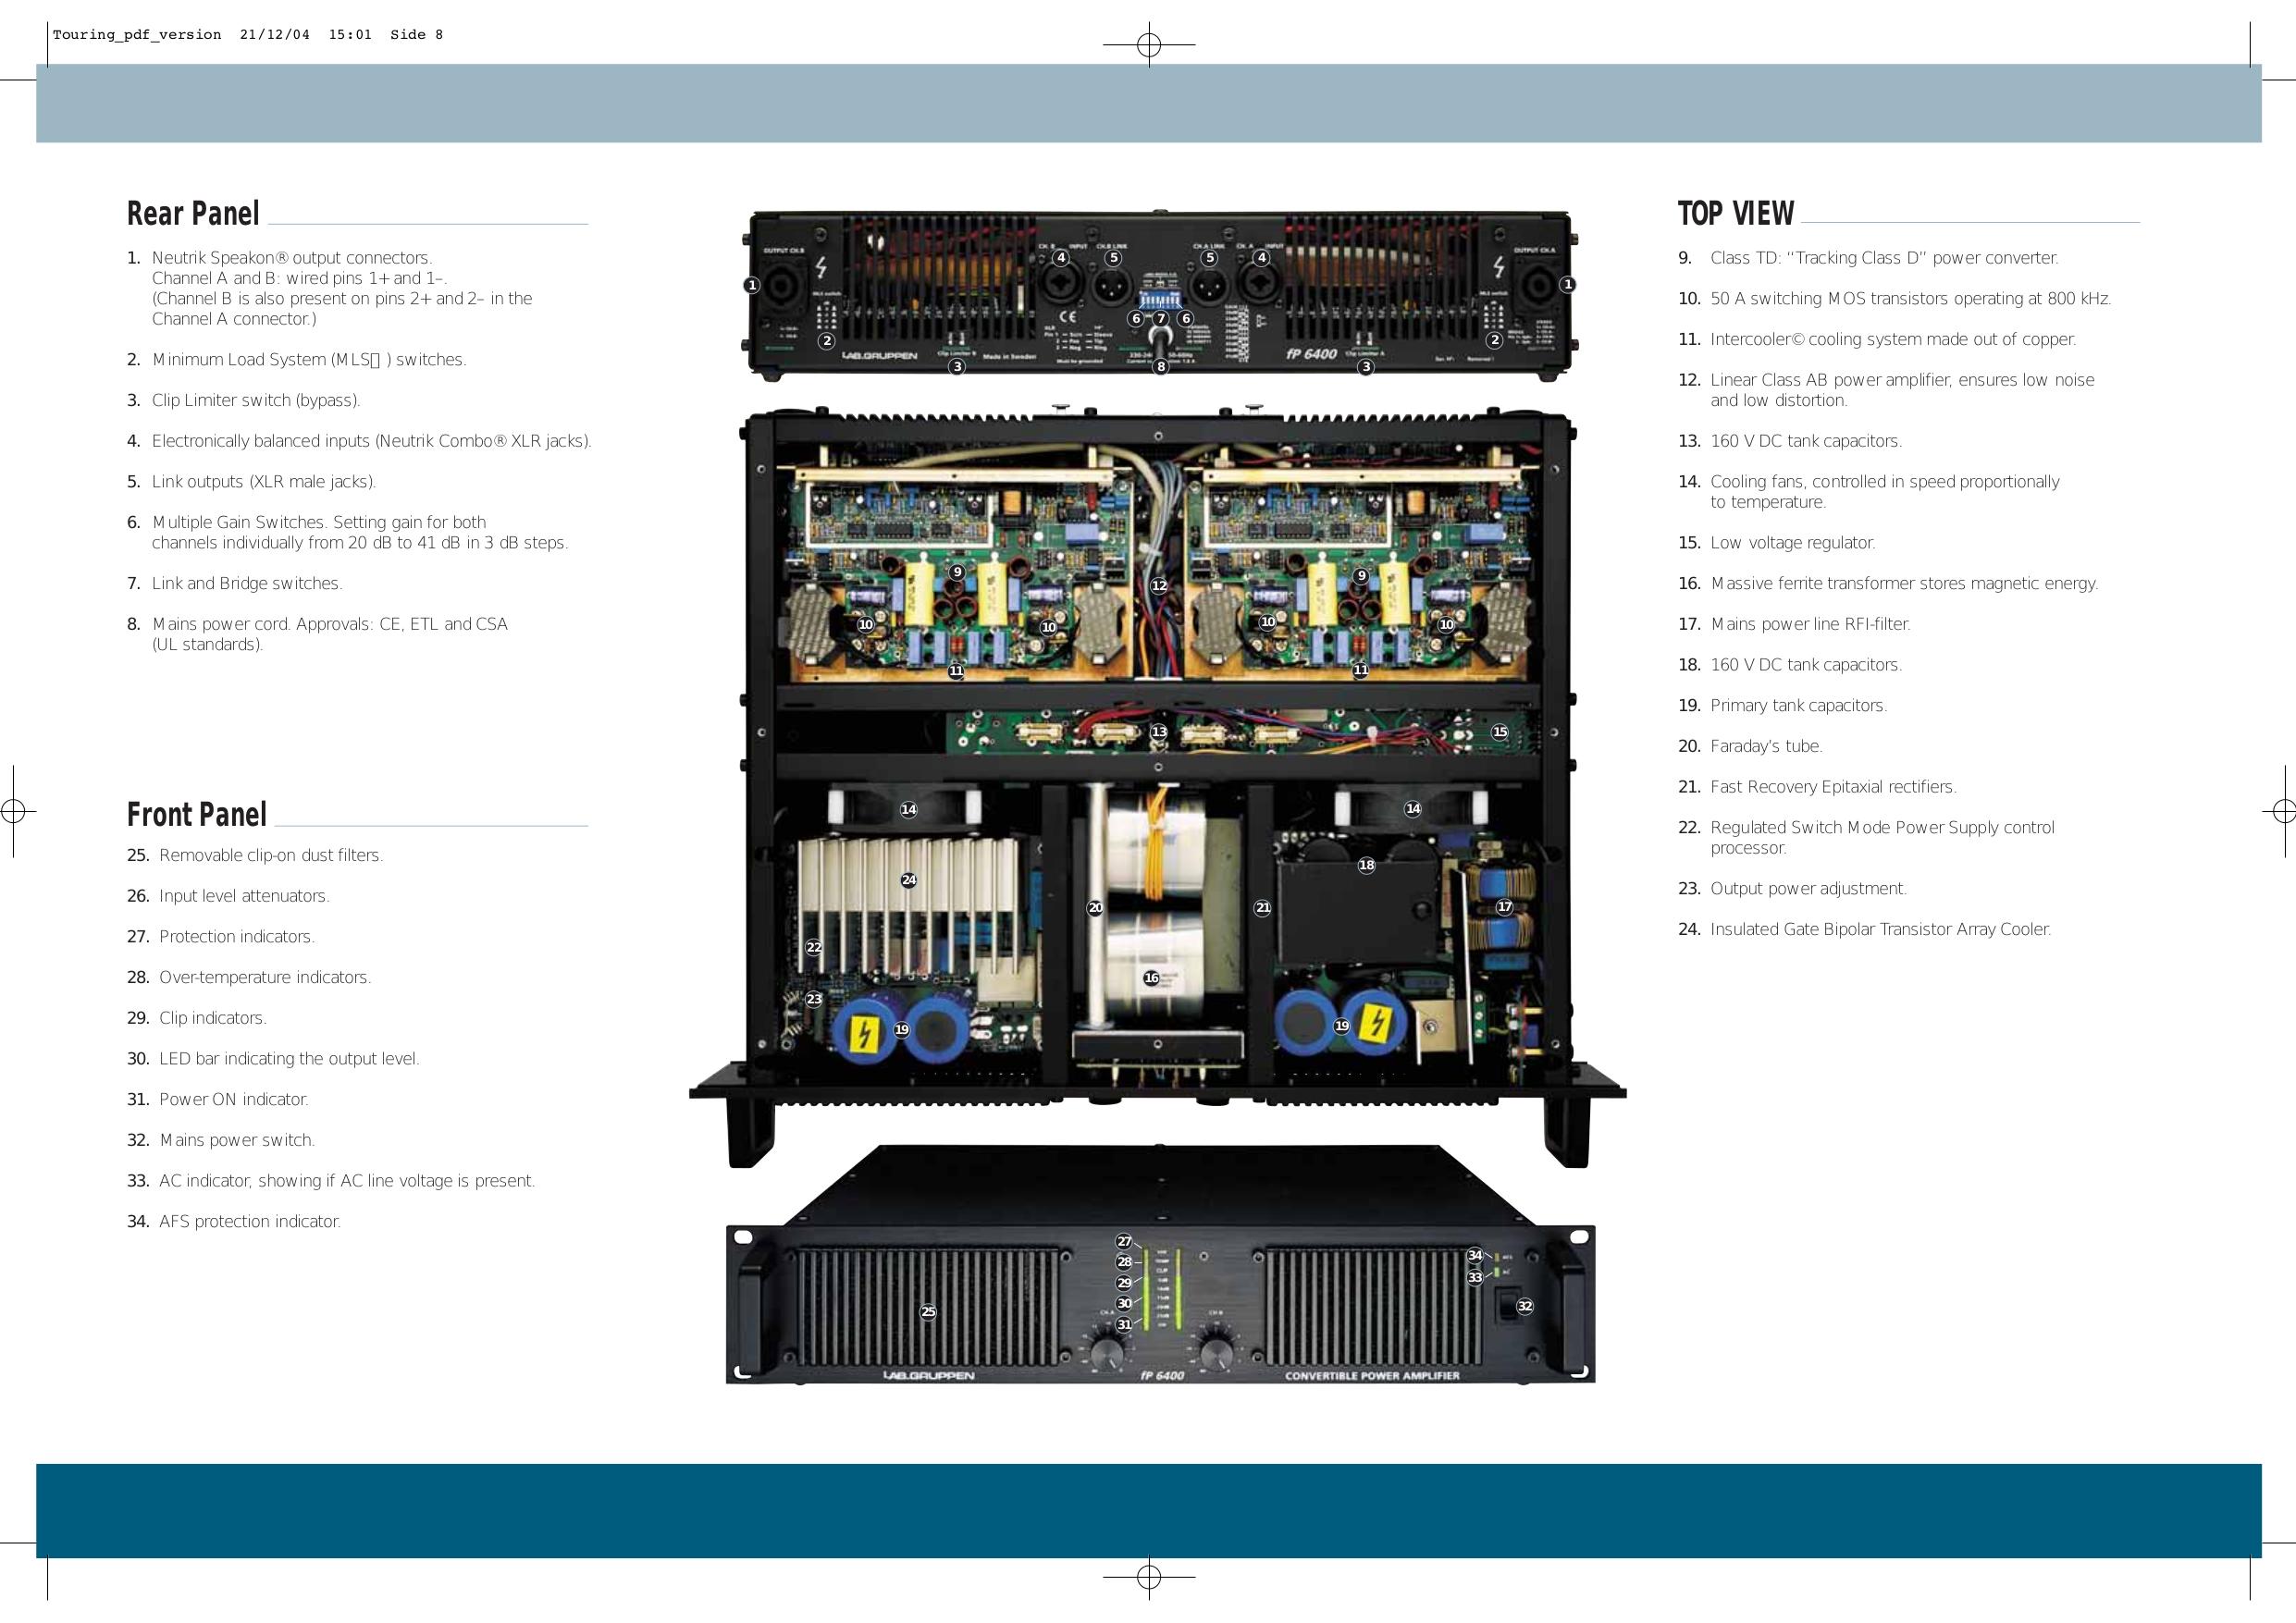 Generating PDFs With Adobe Acrobat Distiller - lifewire.com